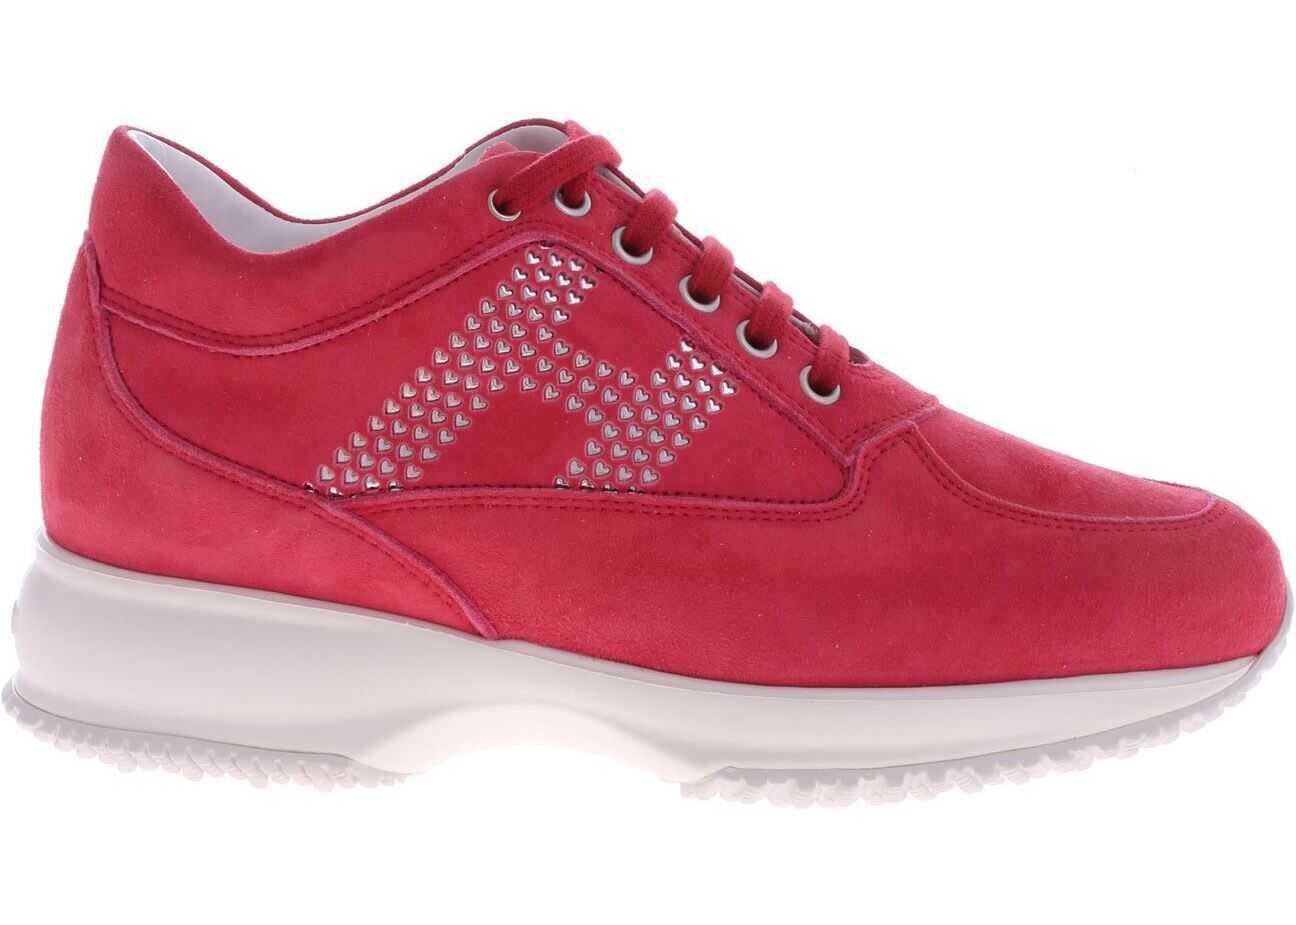 Hogan Interactive Sneakers In Fuchsia Suede Fuchsia